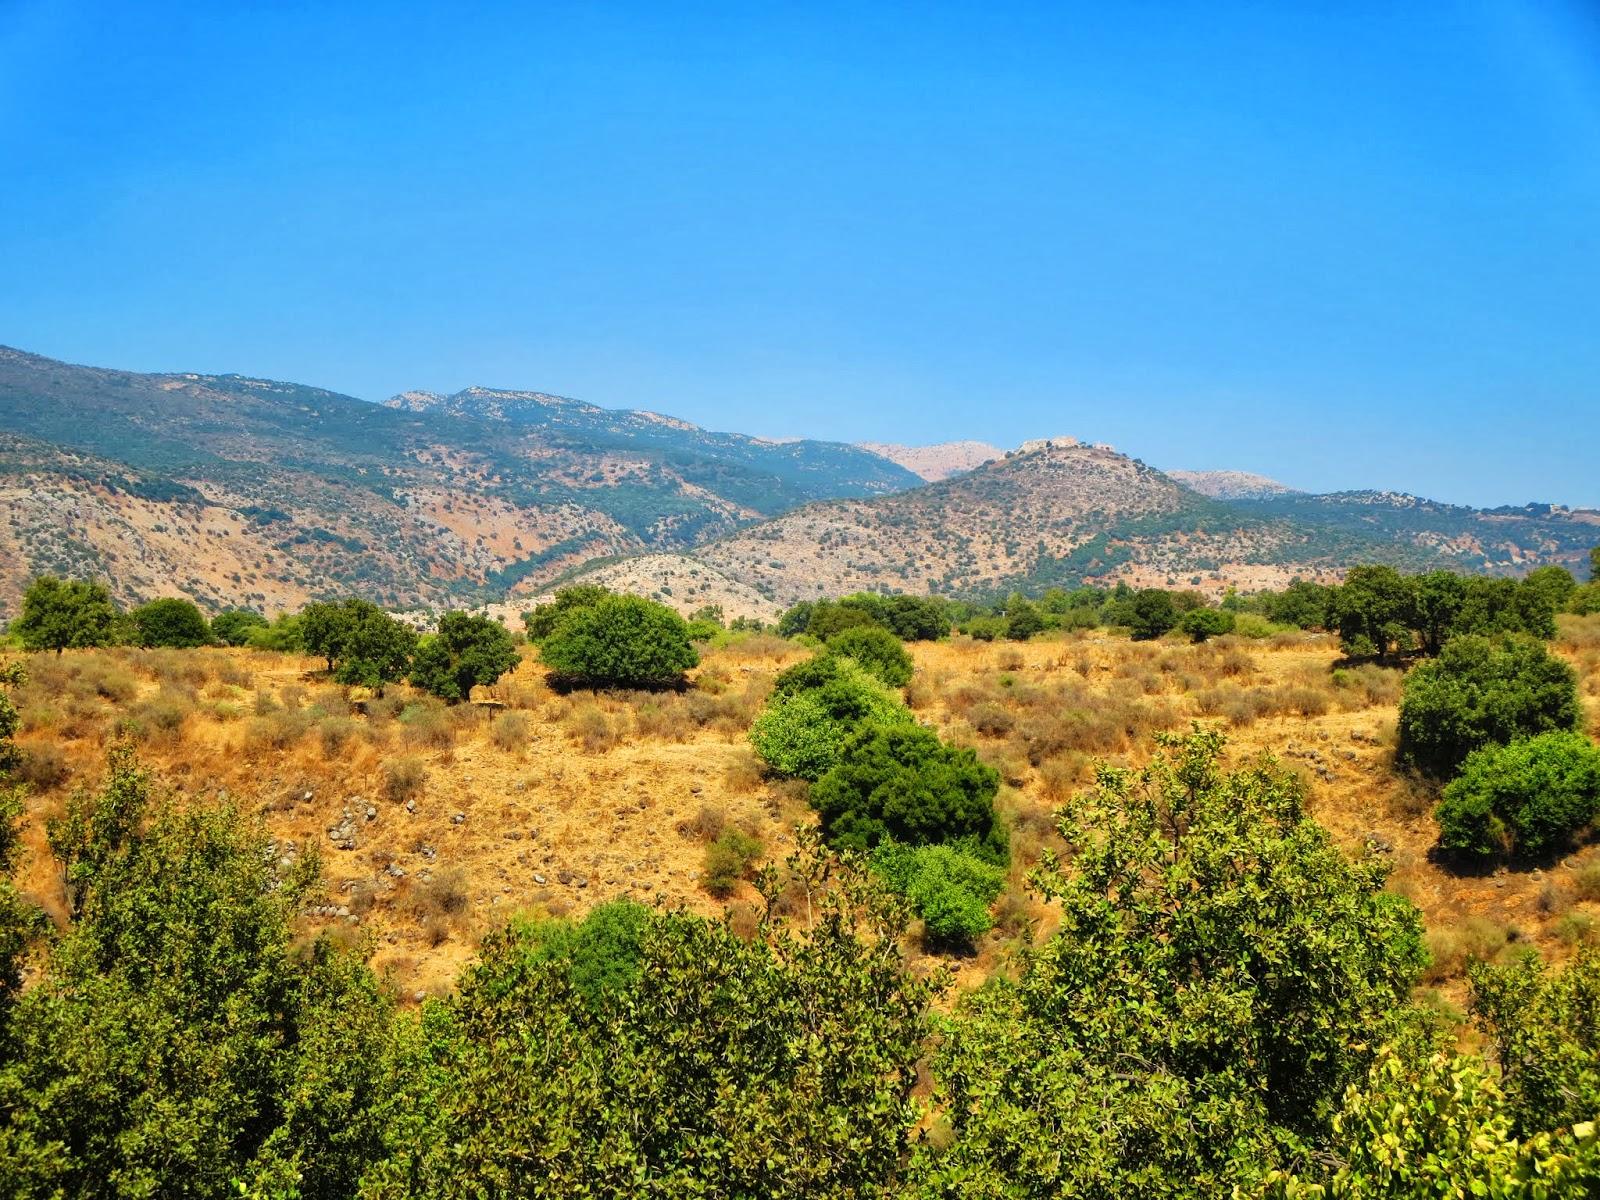 Israele e Cipro Paesaggi del Golan e Israele del Nord